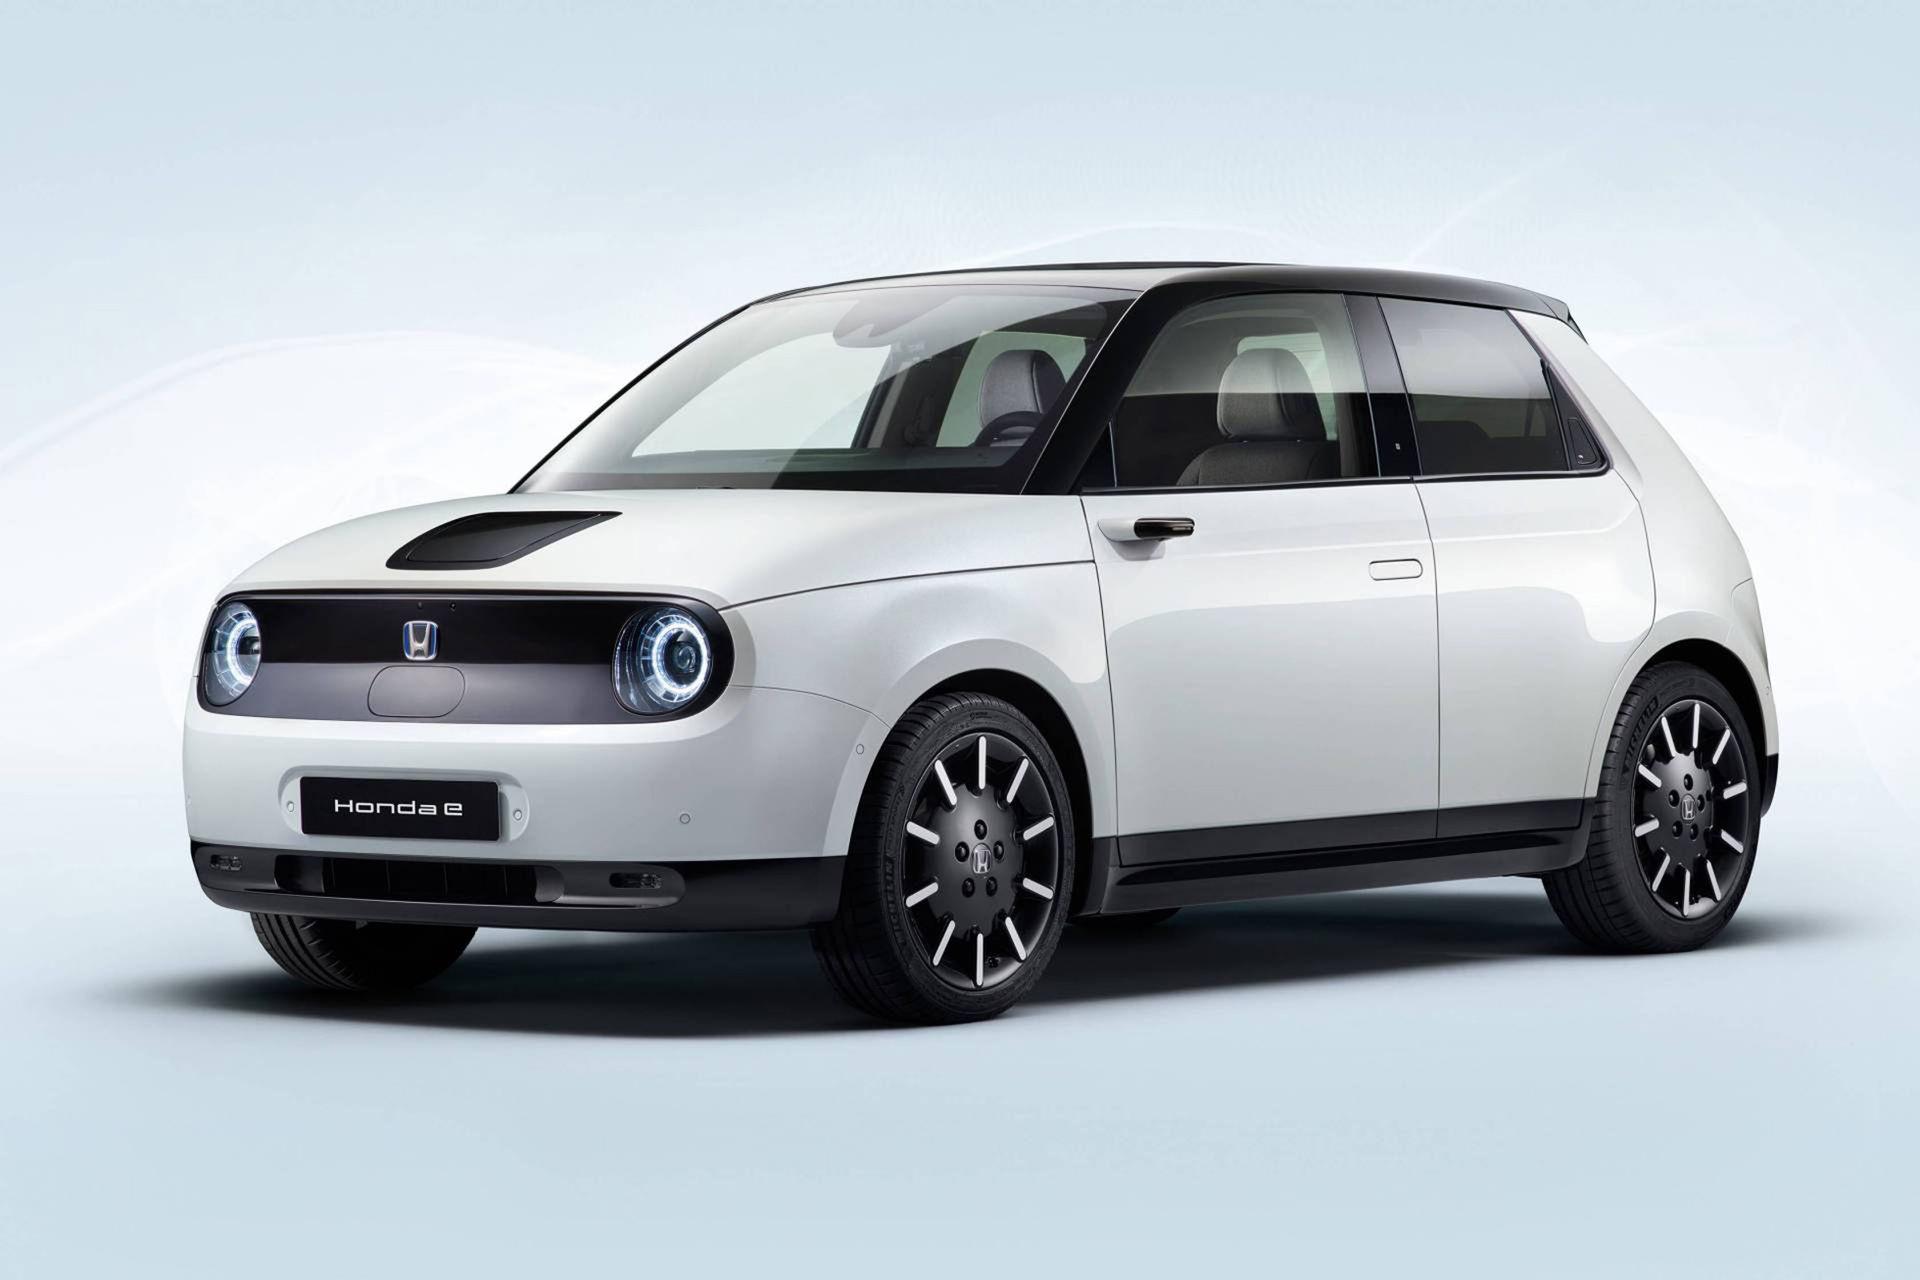 Honda e presenterad i produktionskläder